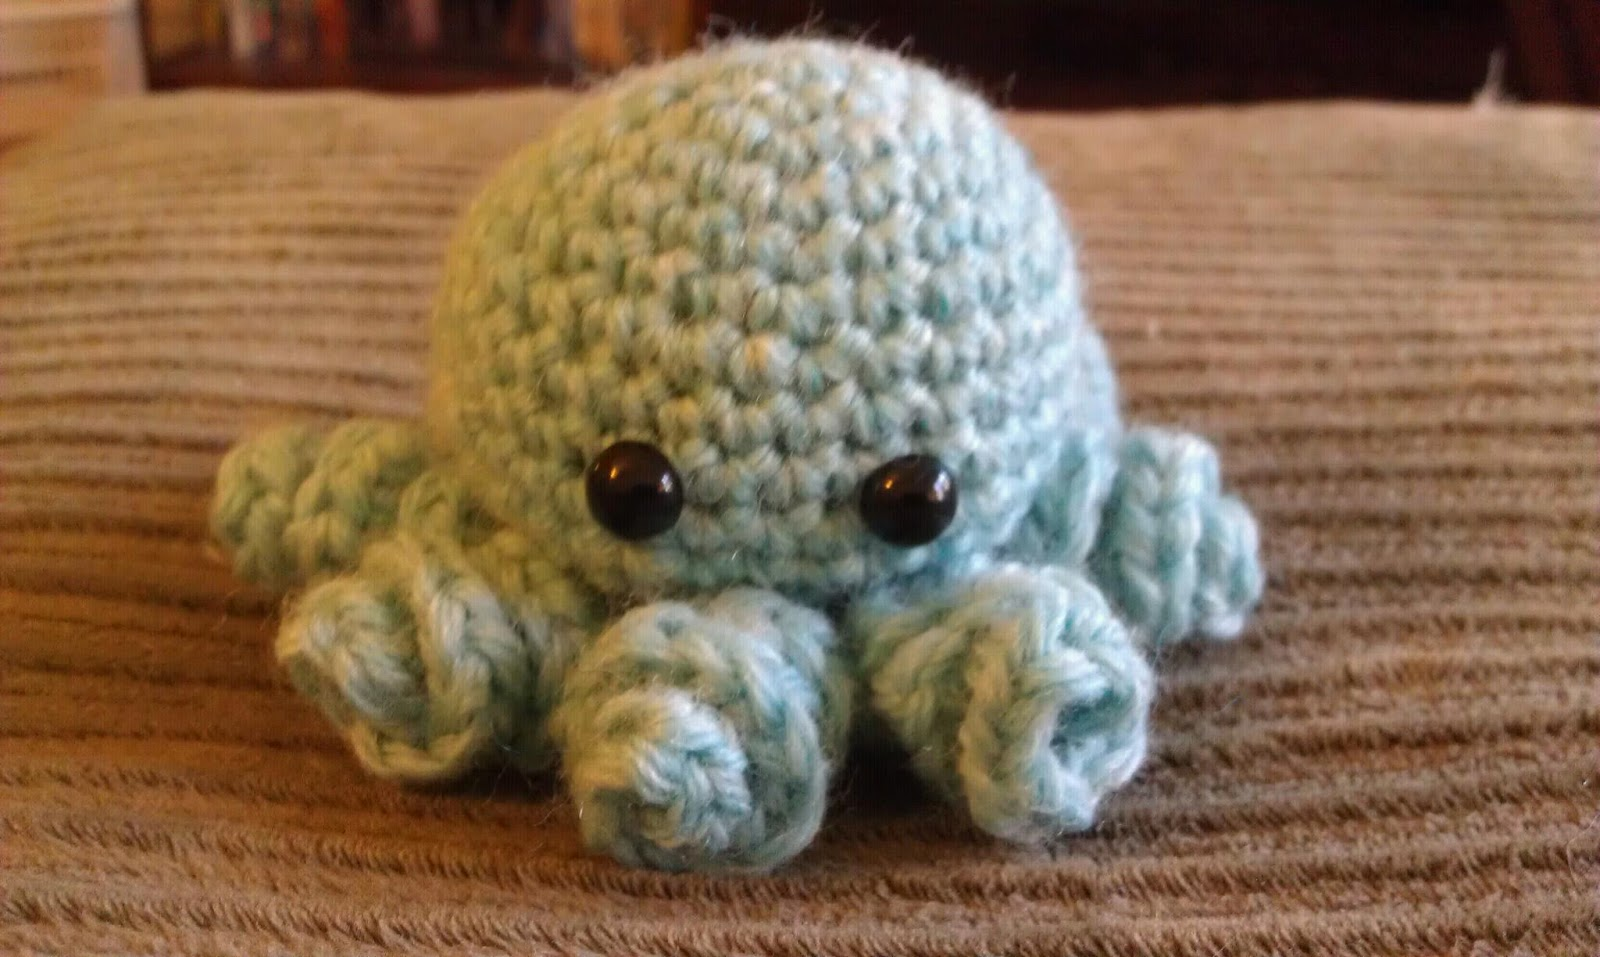 Crochet Church Purse Doll Pattern : ChemKnits: Crochet Mini Octopus